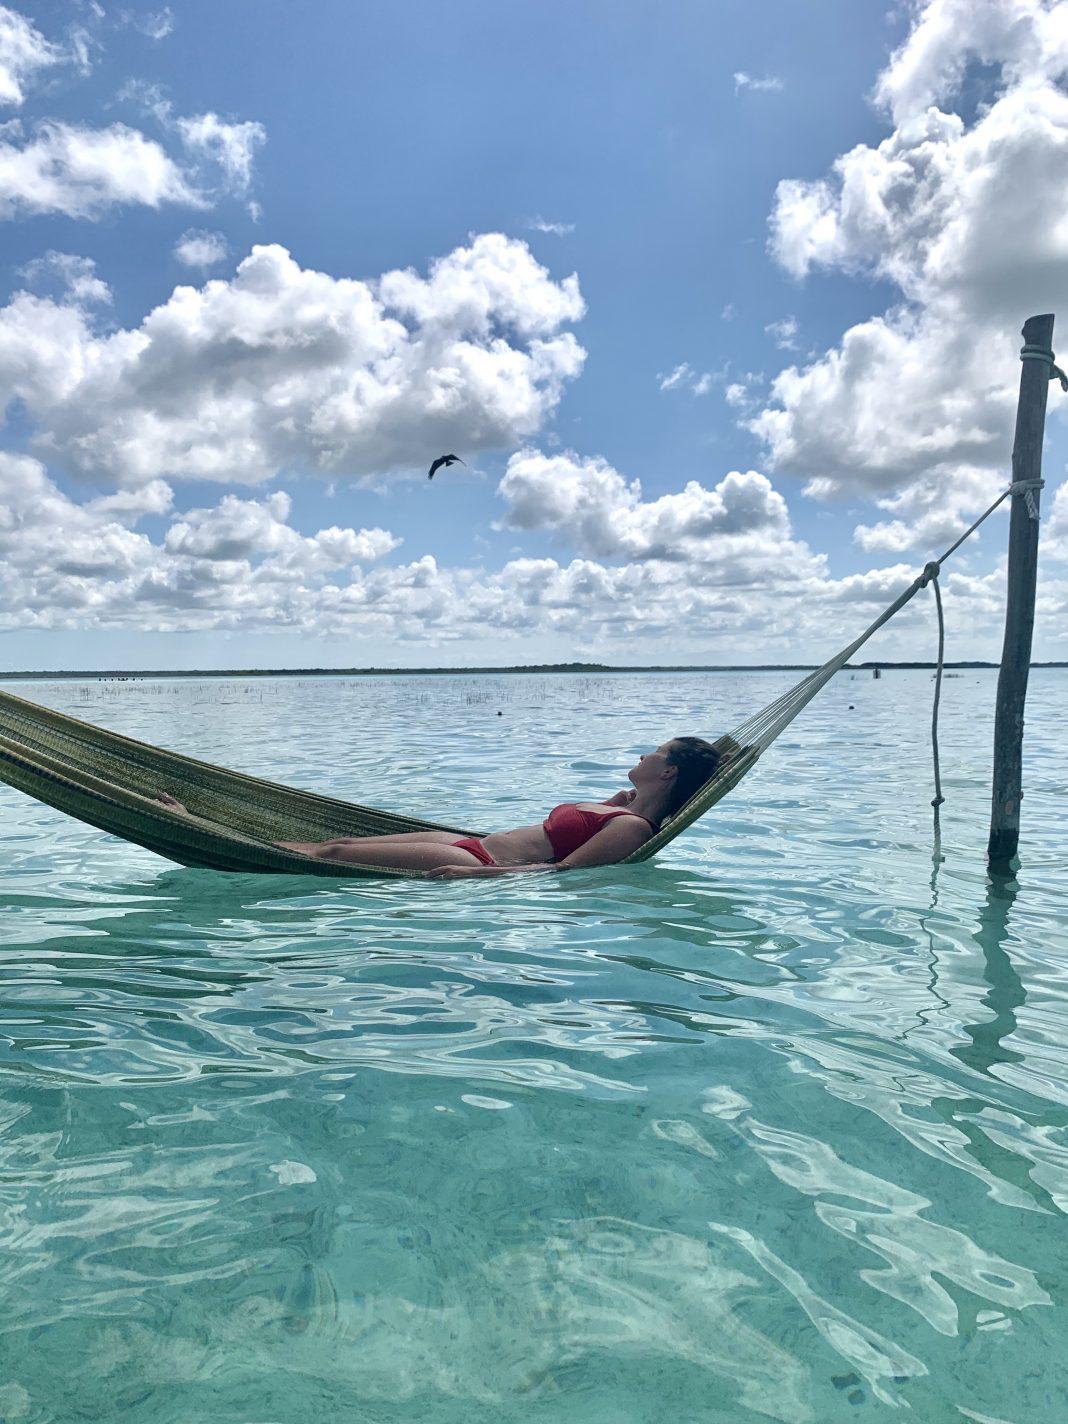 Chillen in de hangmat - Yucatán in Mexico